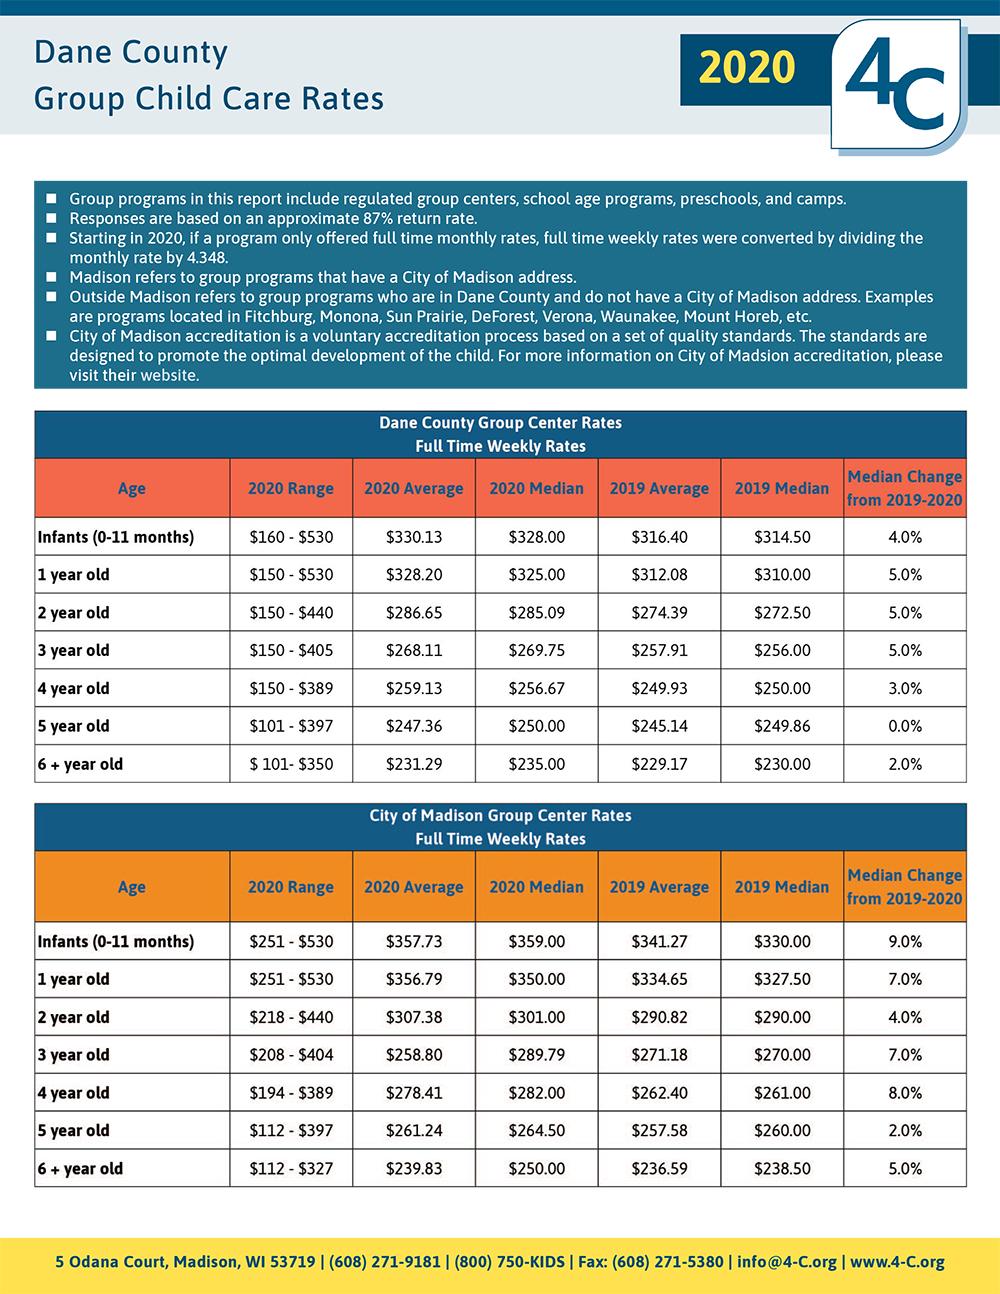 Dane County Group CC Rates 2020